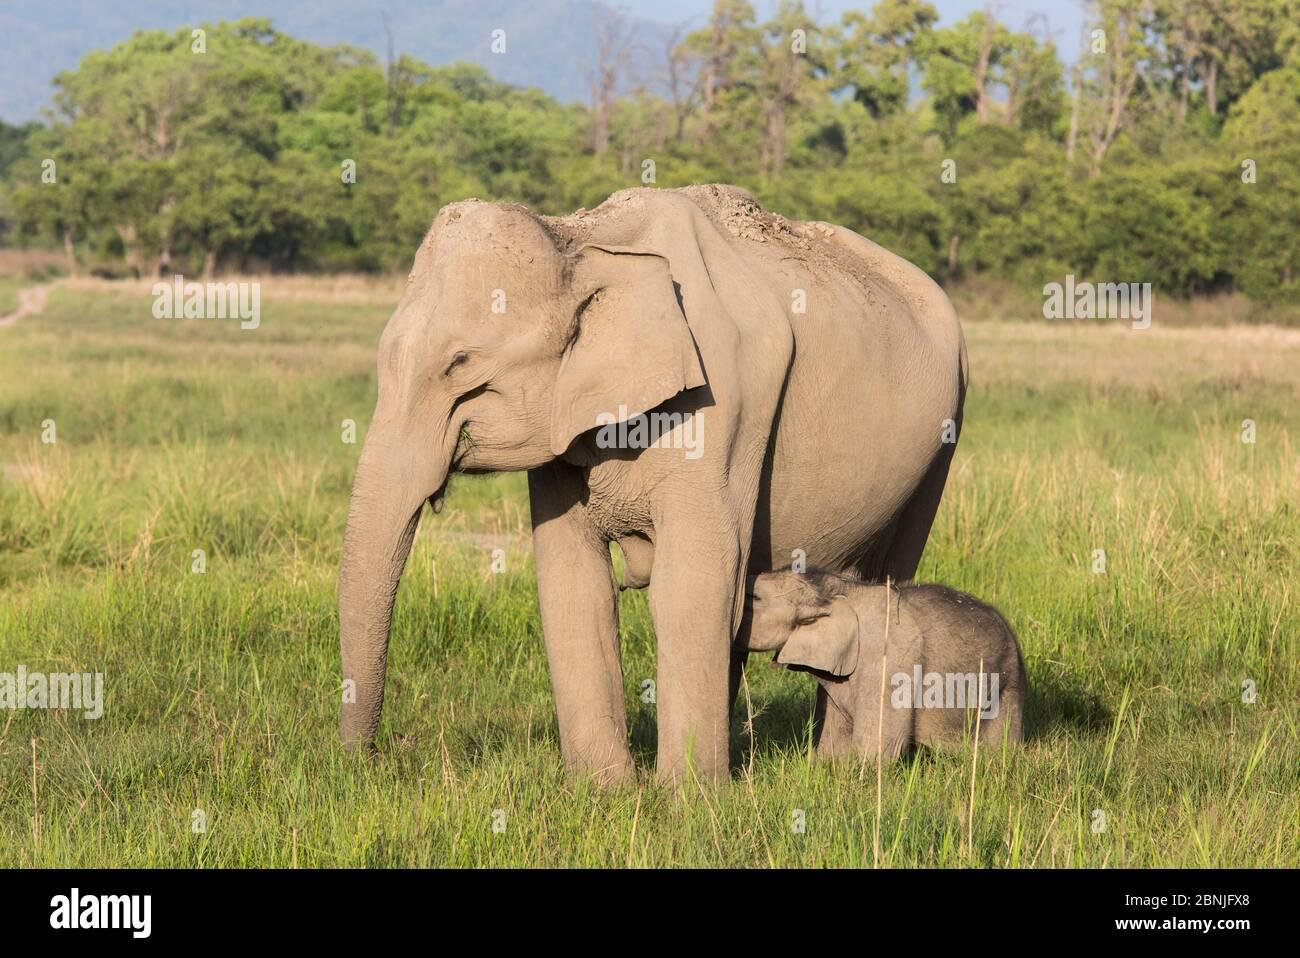 Asiatic elephant (Elephas maximus), calf suckling while mother feeding grass. Jim Corbett National Park, India. Stock Photo